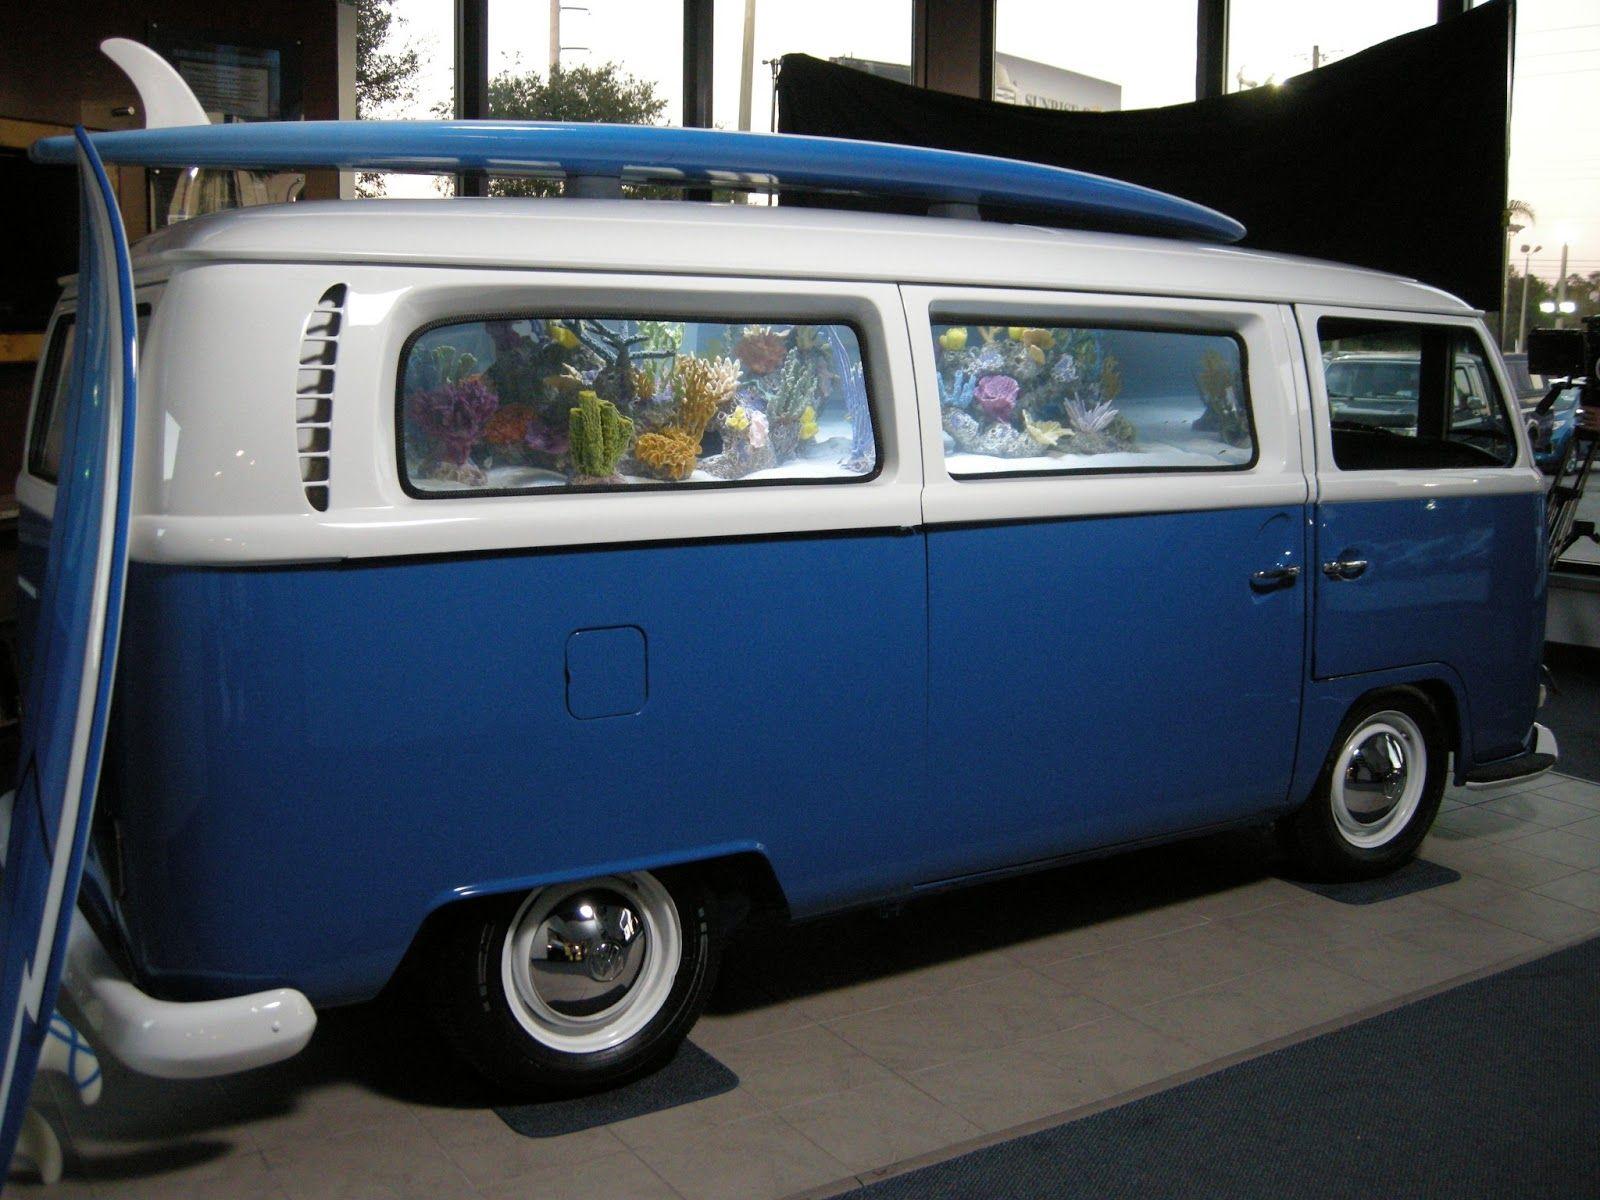 Fish tank kings season 3 - Vw Bus Tank